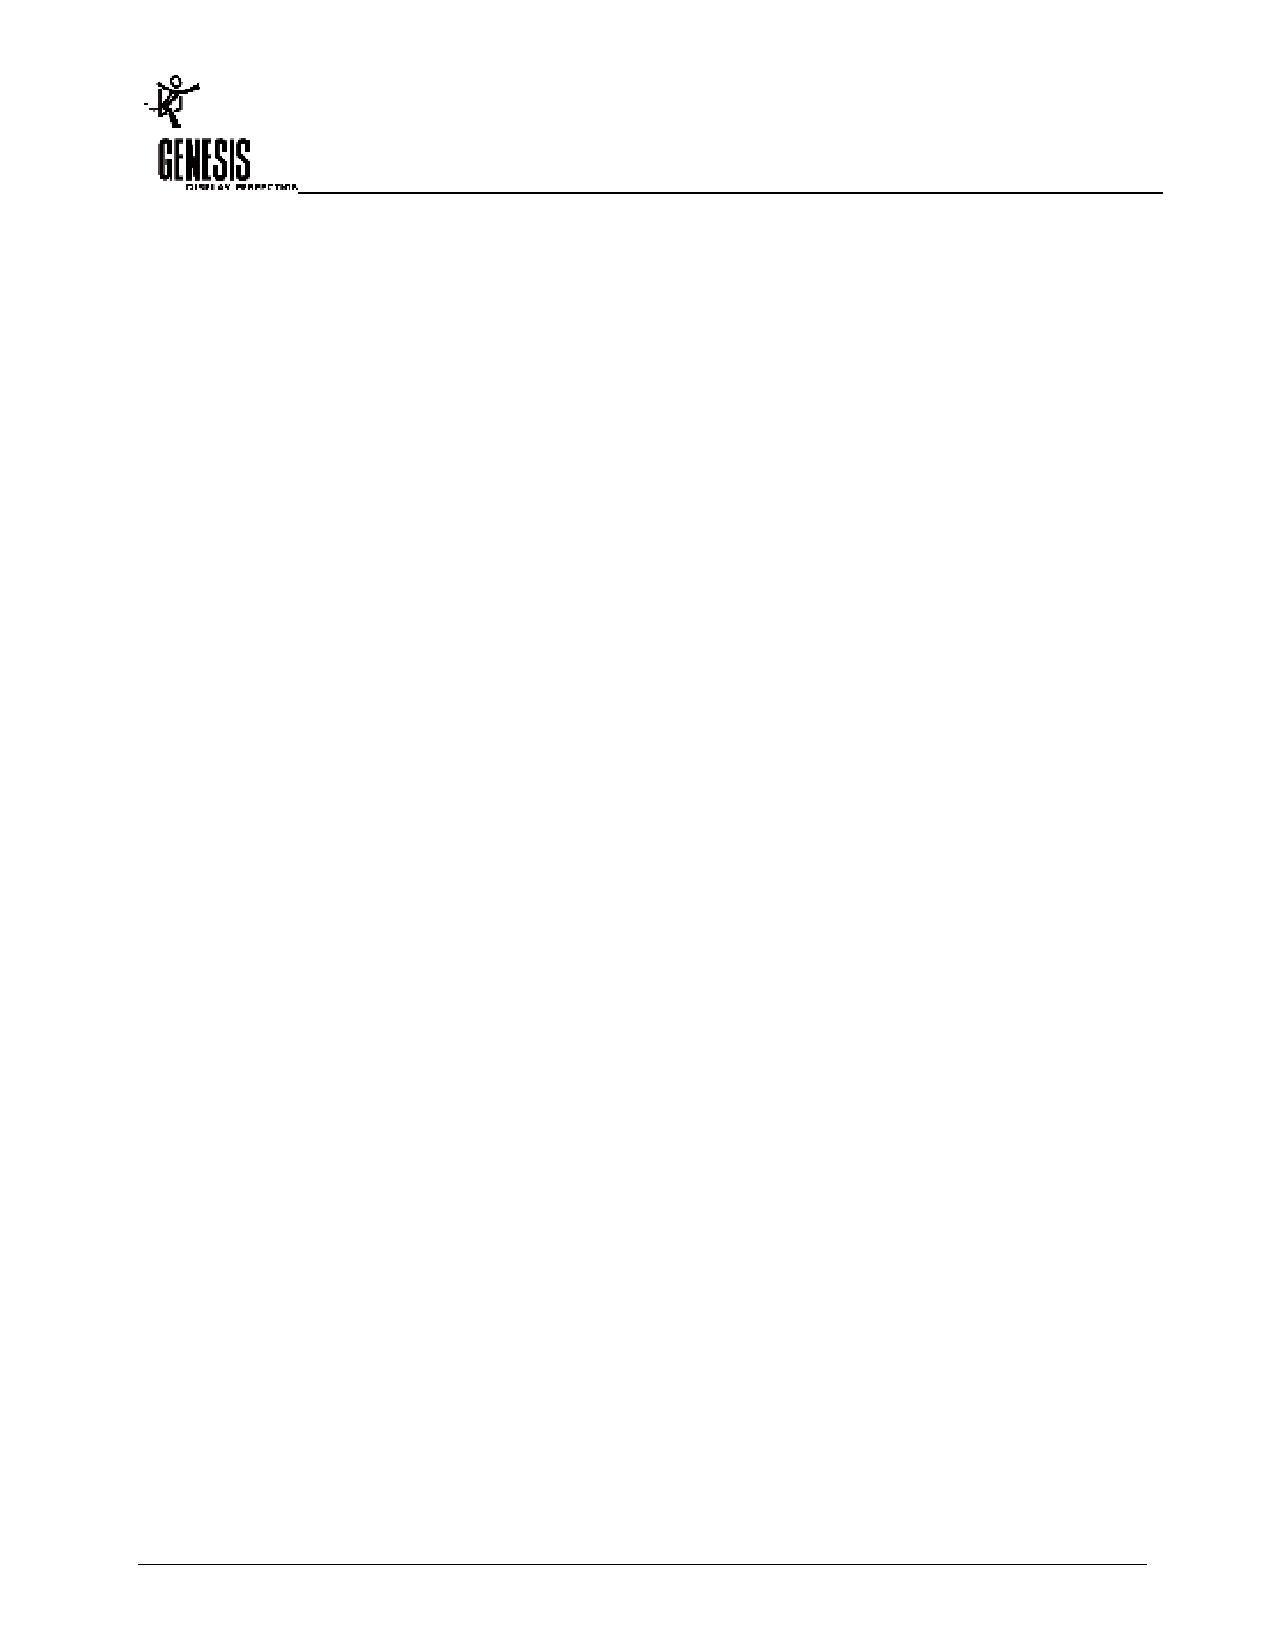 gm6015 pdf, 반도체, 판매, 대치품